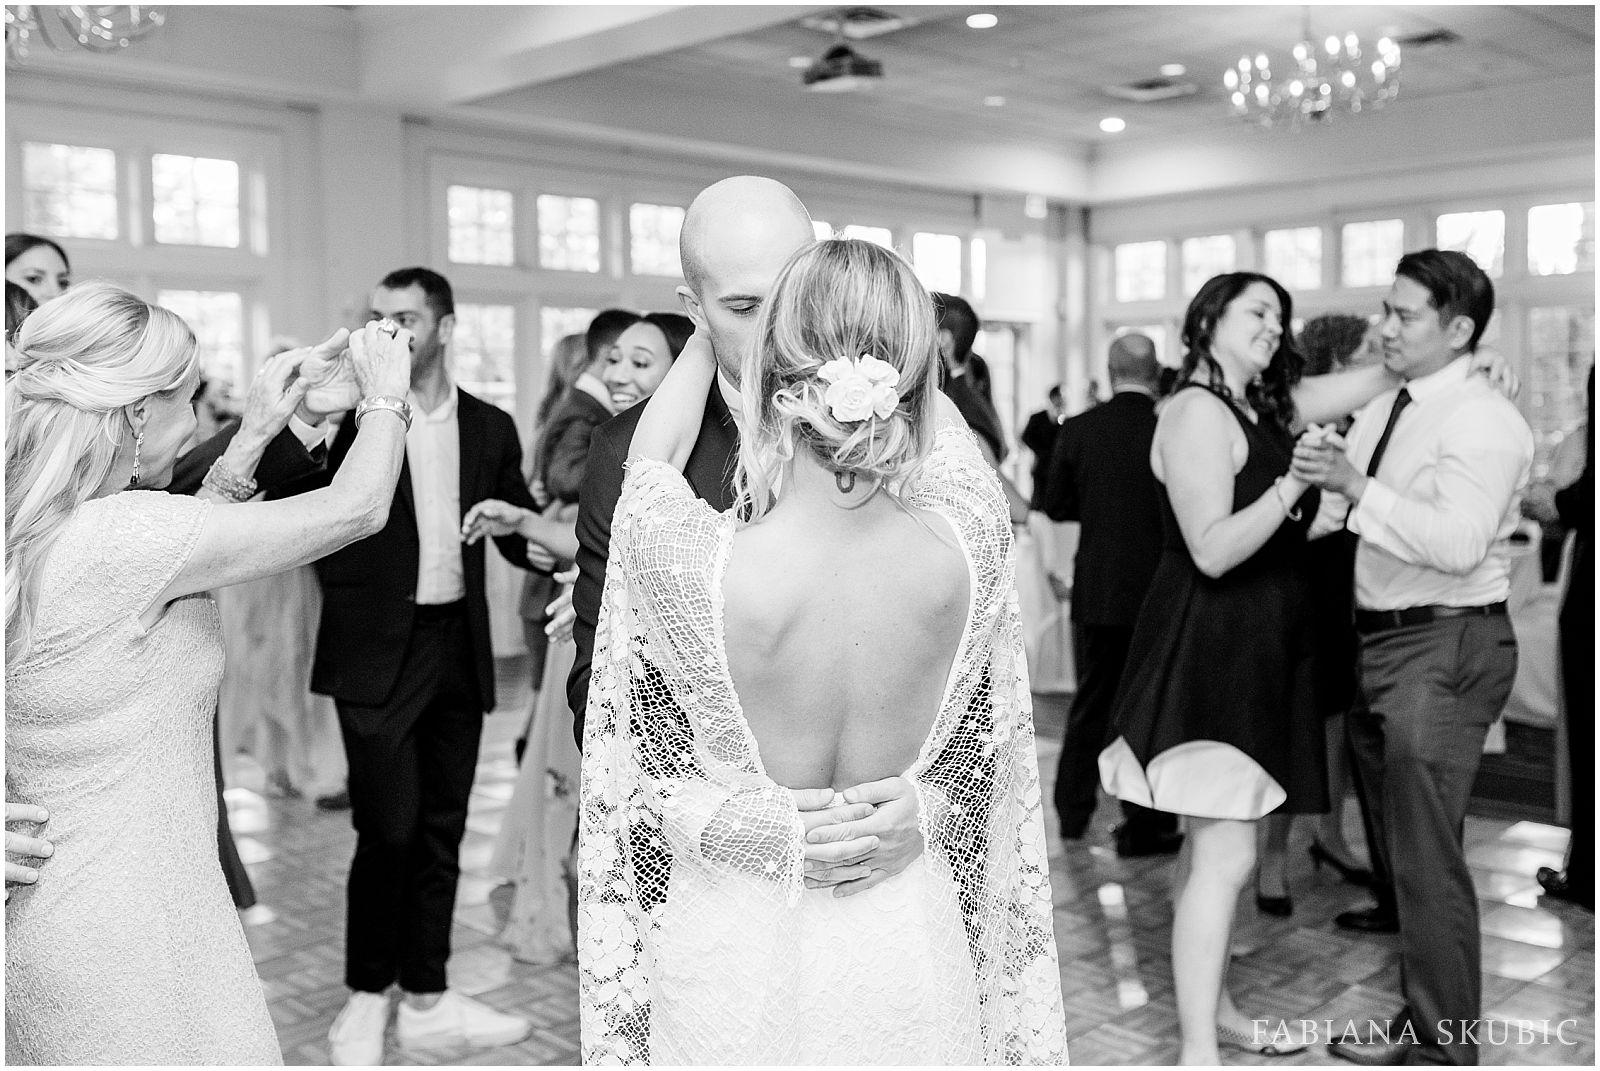 FabianaSkubic_H&M_Wedding_0056.jpg